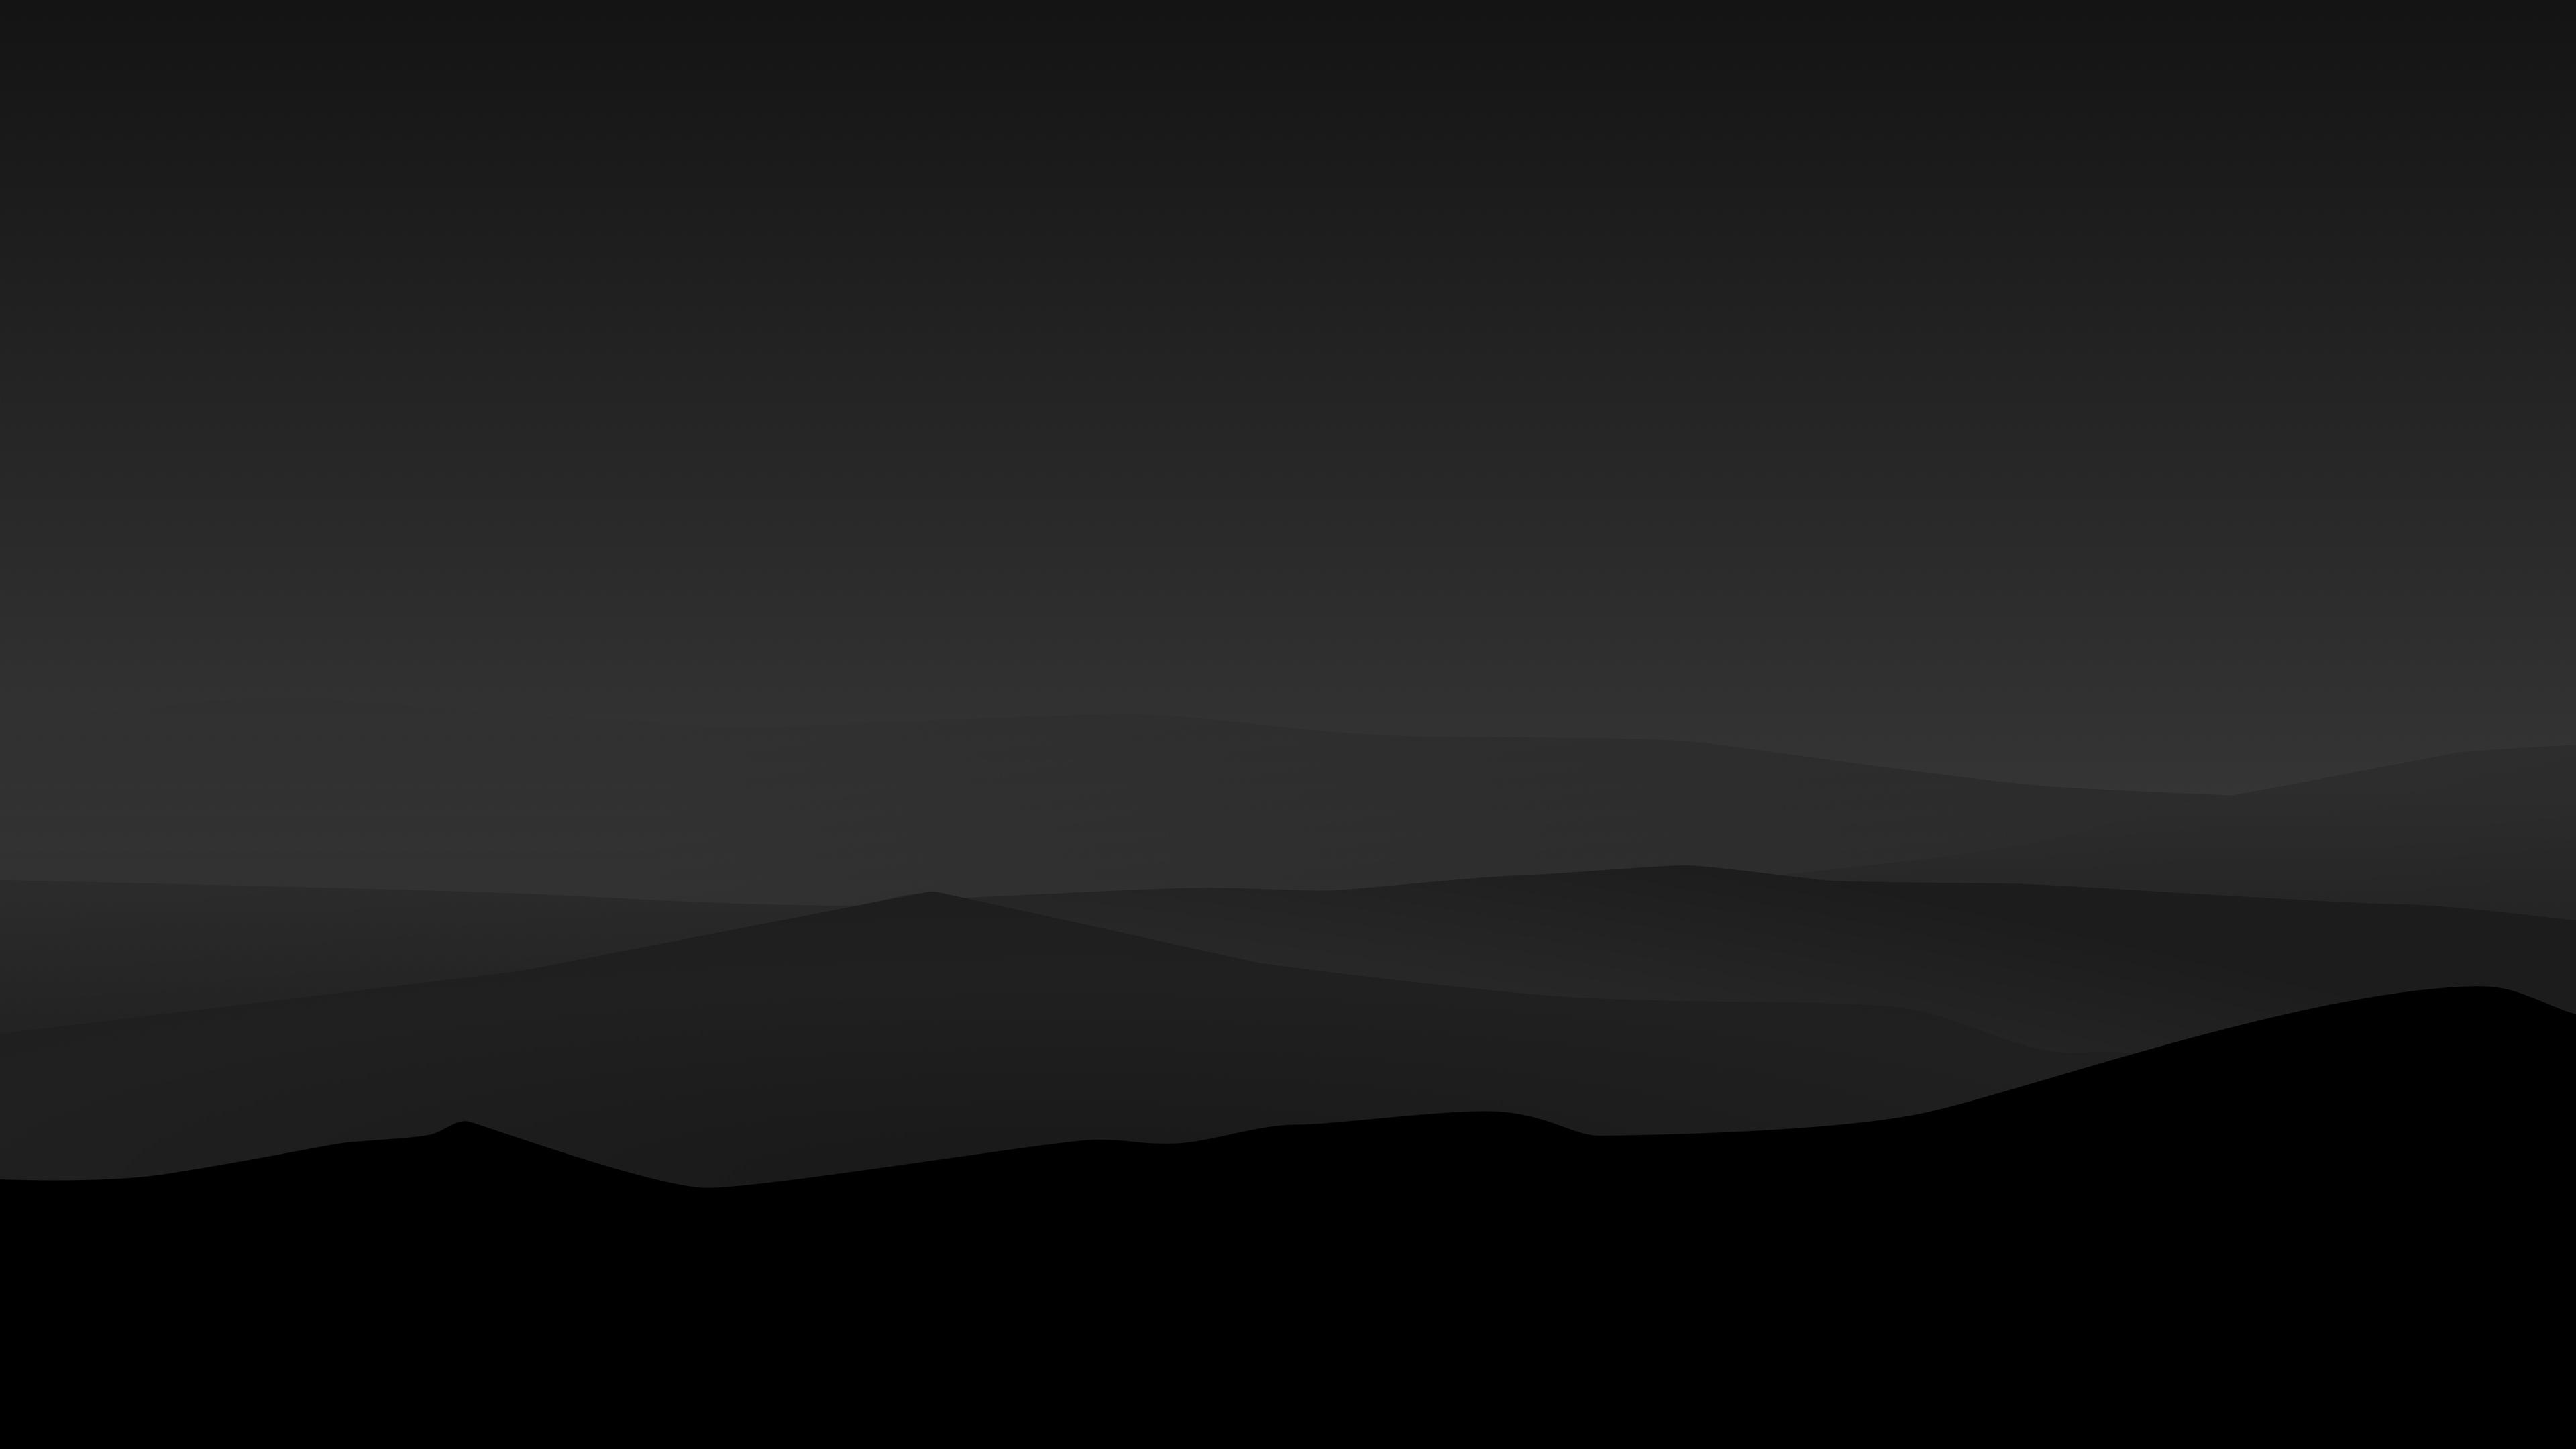 Wallpaper 4k Dark Night Mountains Minimalist 4k 4k Wallpapers Black Wallpapers Dark Wallpapers Dribbble Wallpapers Hd Wallpapers Minimalism Wallpapers Minimalist Wallpapers Mountains Wallpapers Oled Wallpapers Simple Background Wallpapers